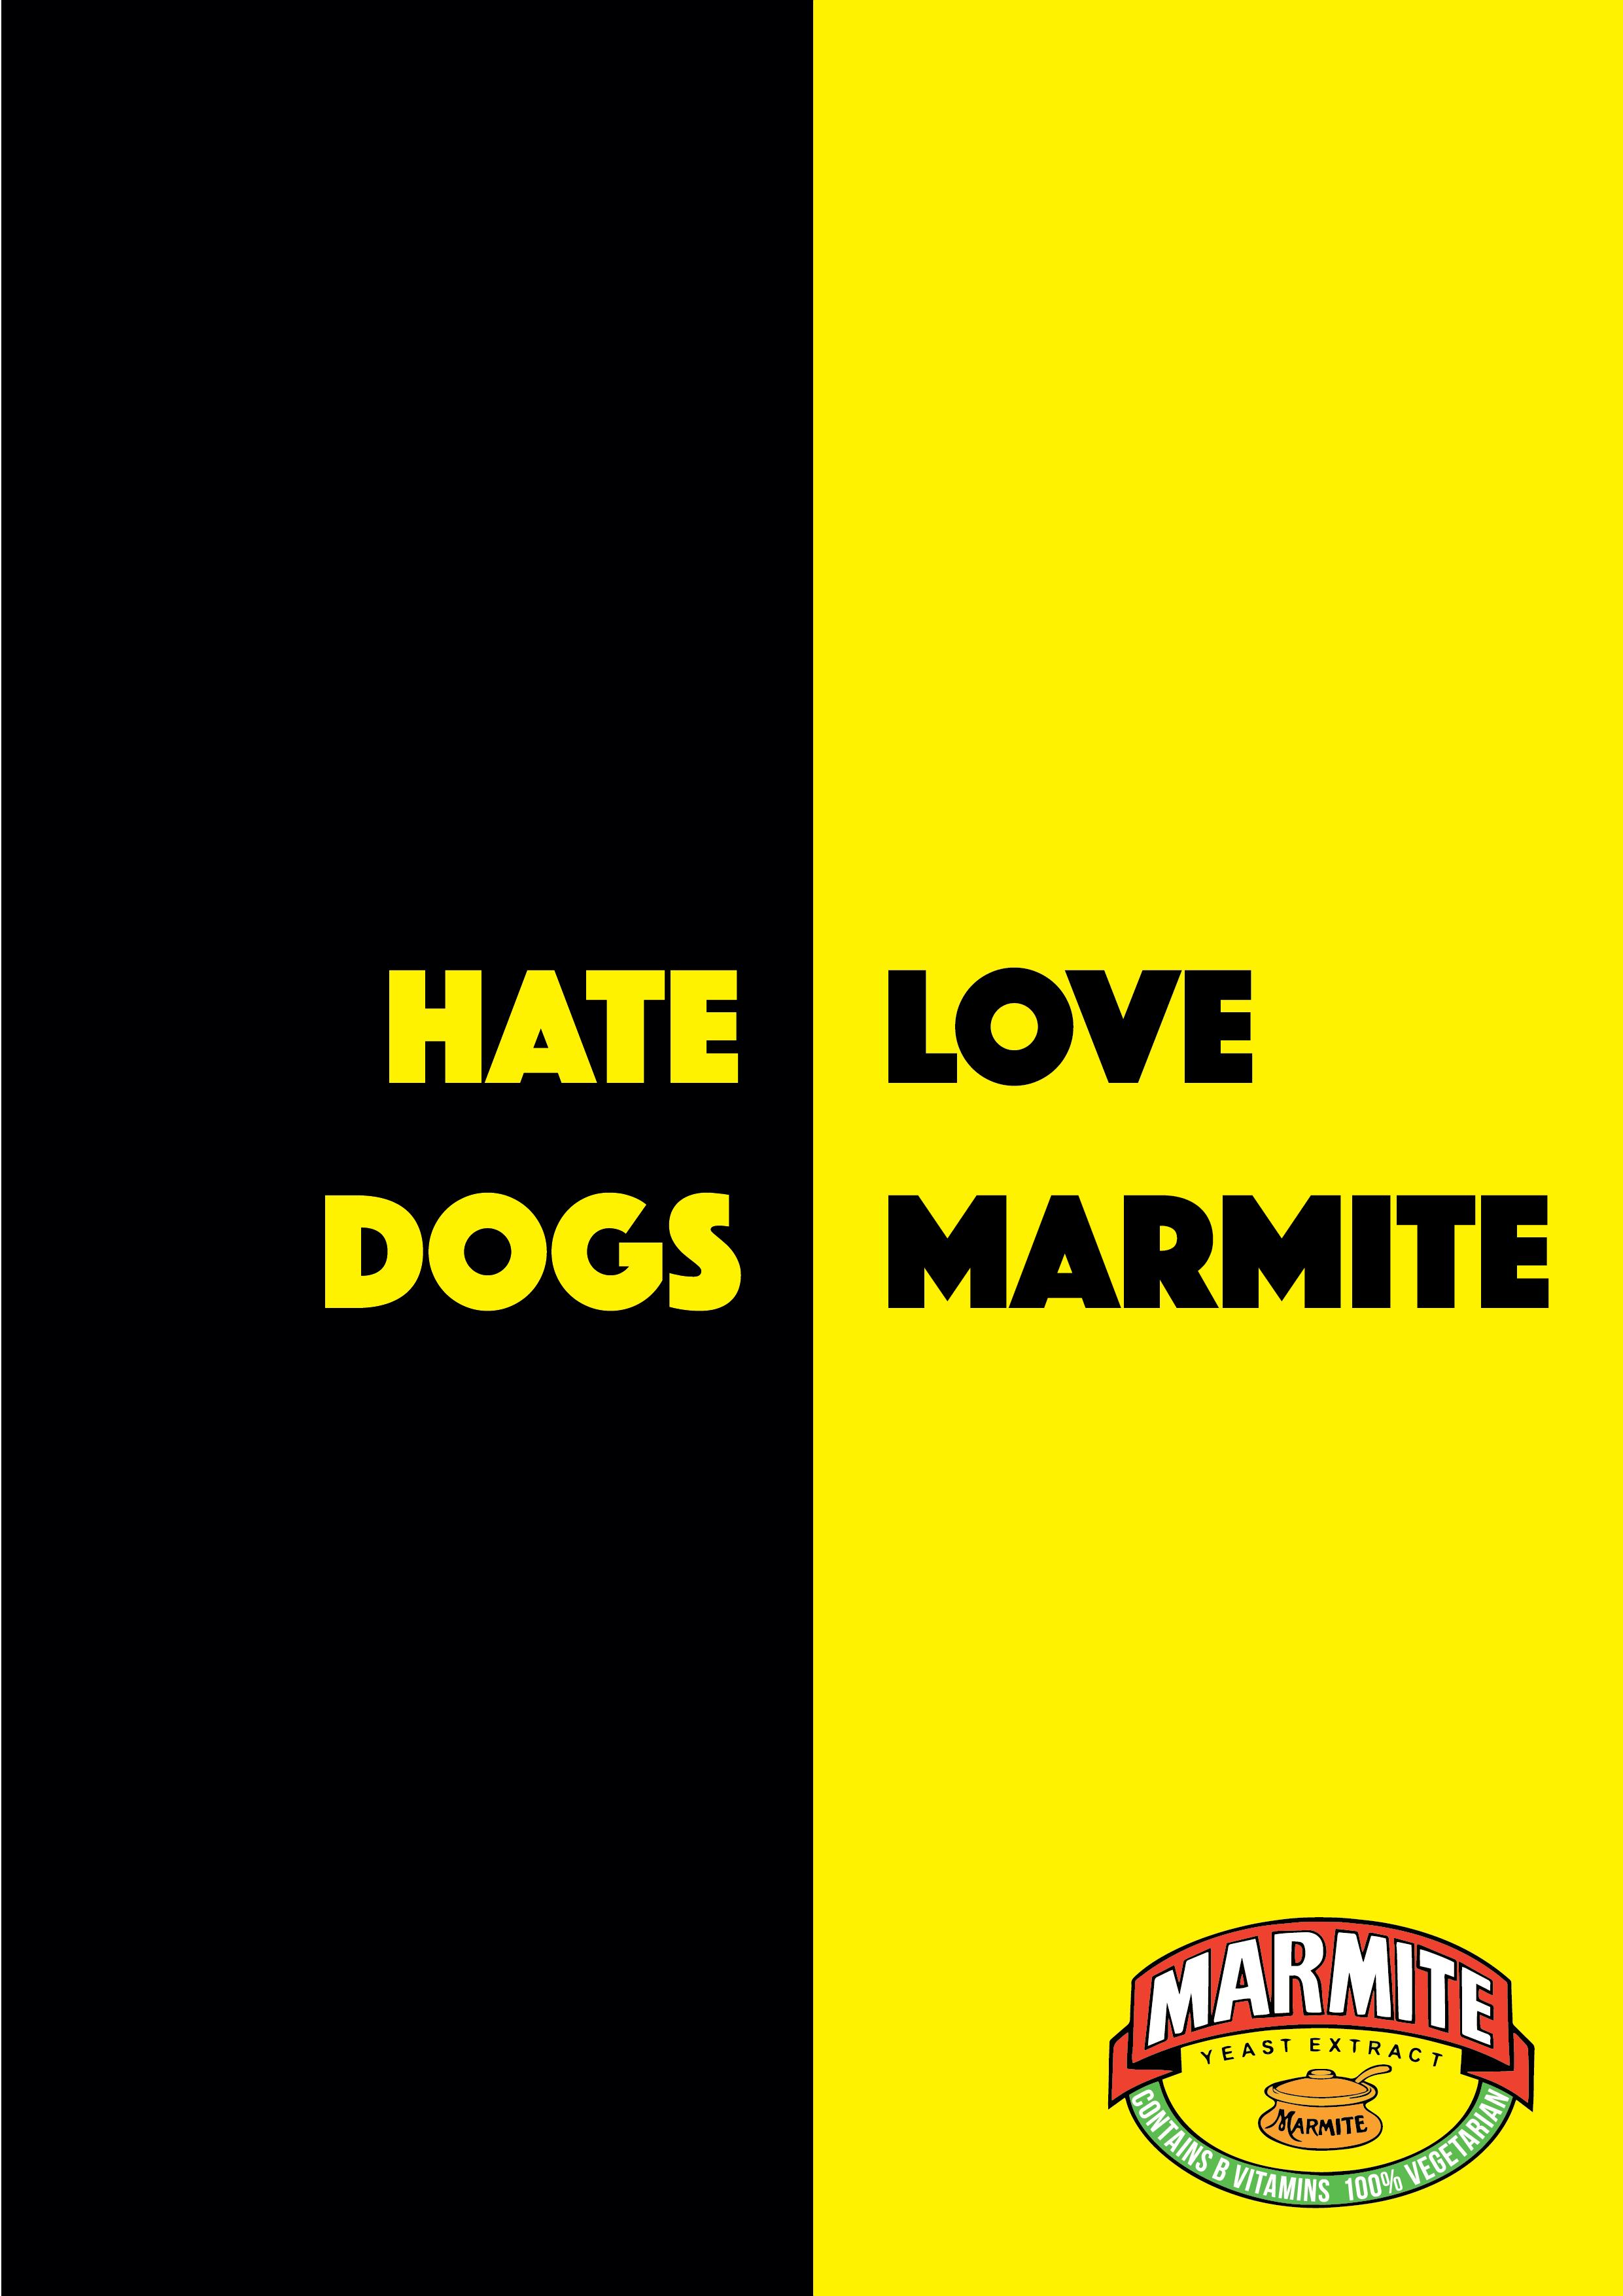 Marmate-05.png